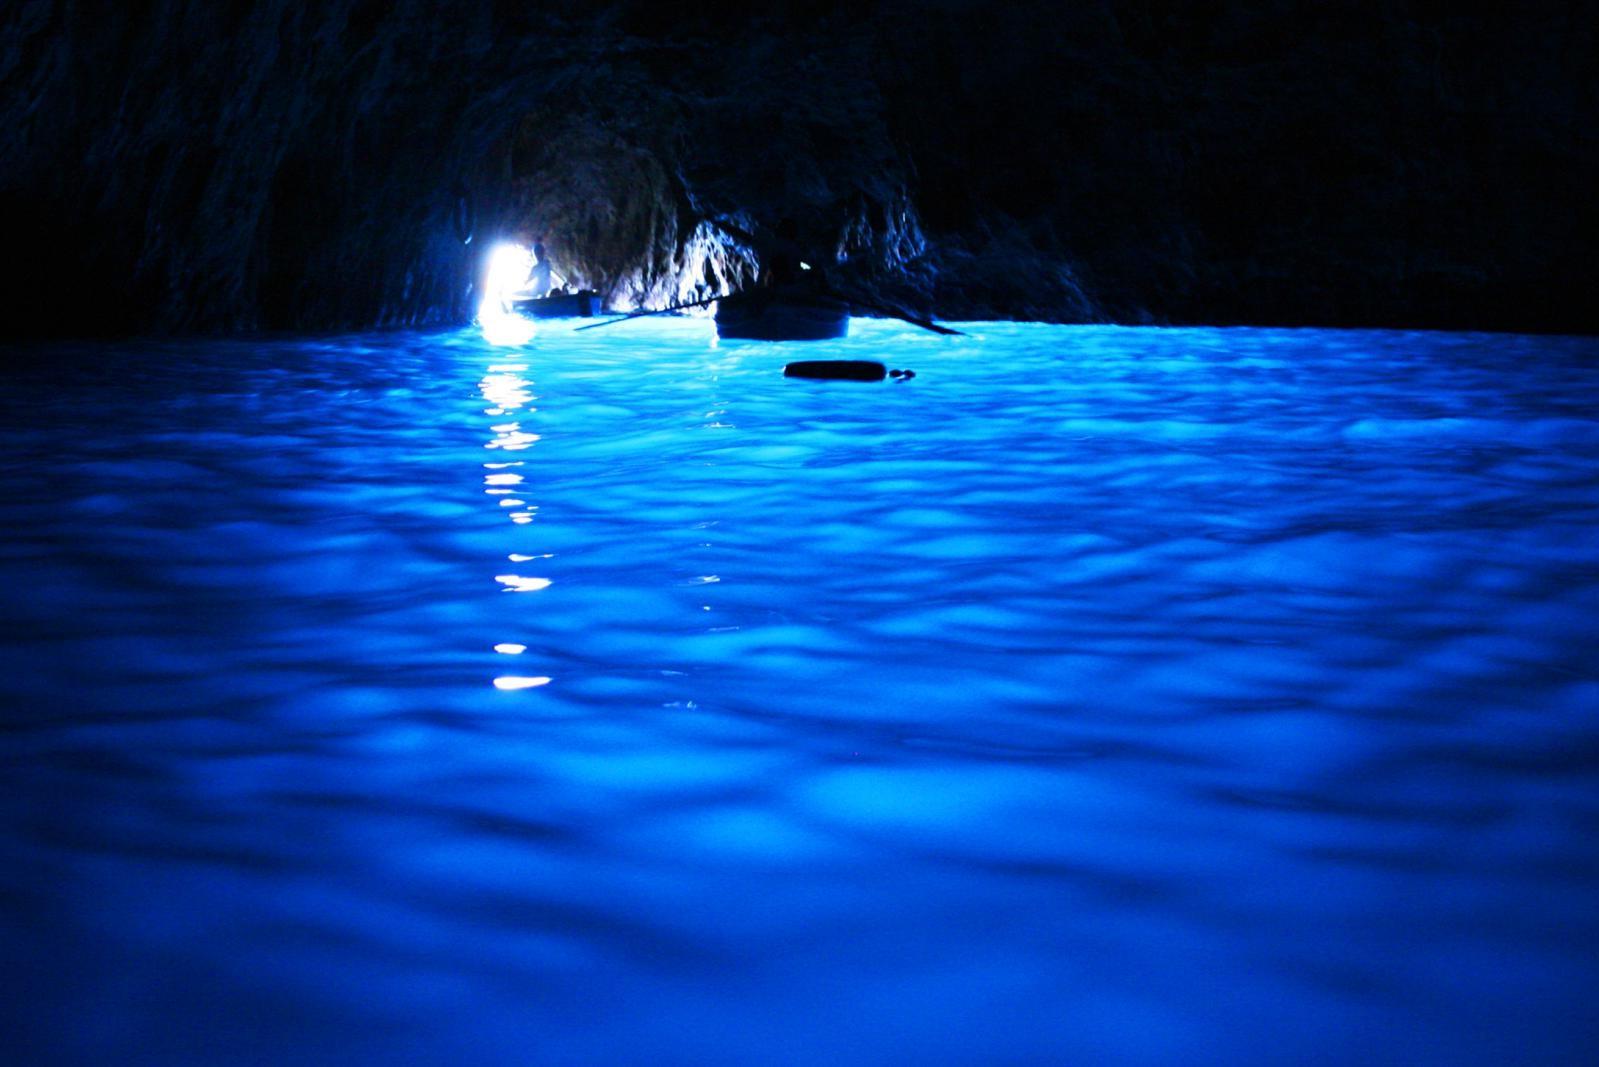 La grotta azzurra |  Paradisi naturali in giro per l'Italia | BrainBerries